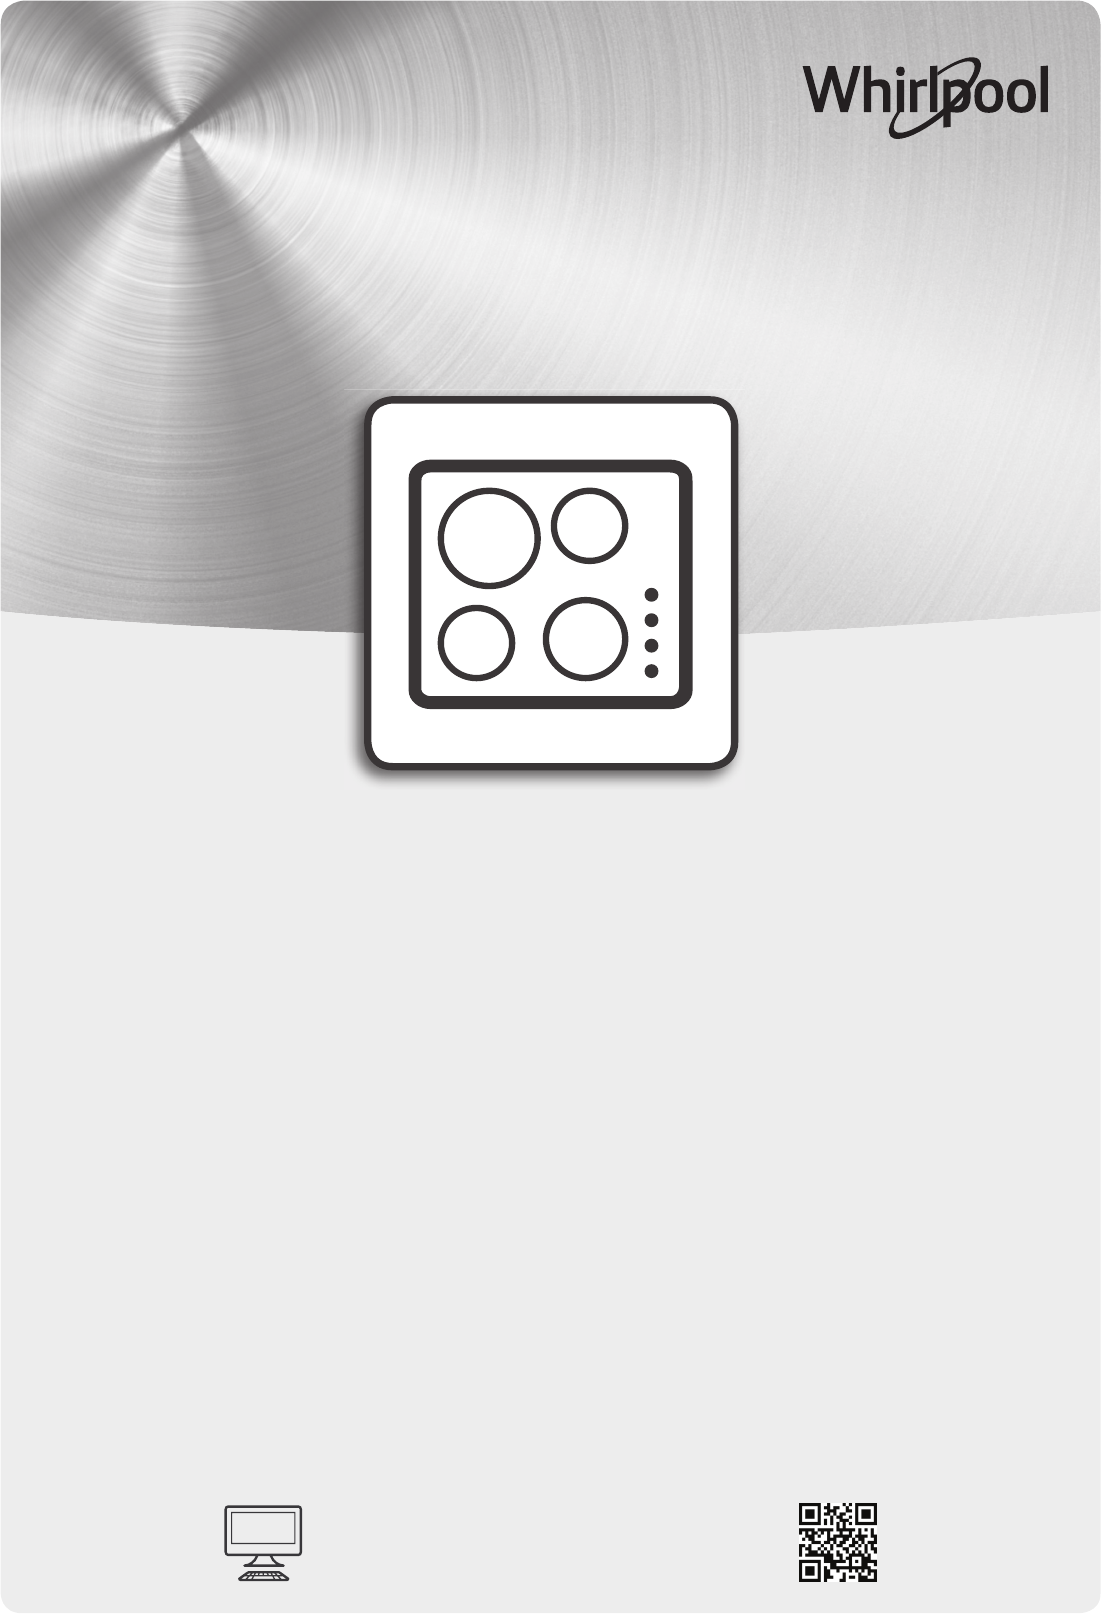 Whirlpool Smo 658c Bt Ixl Manual